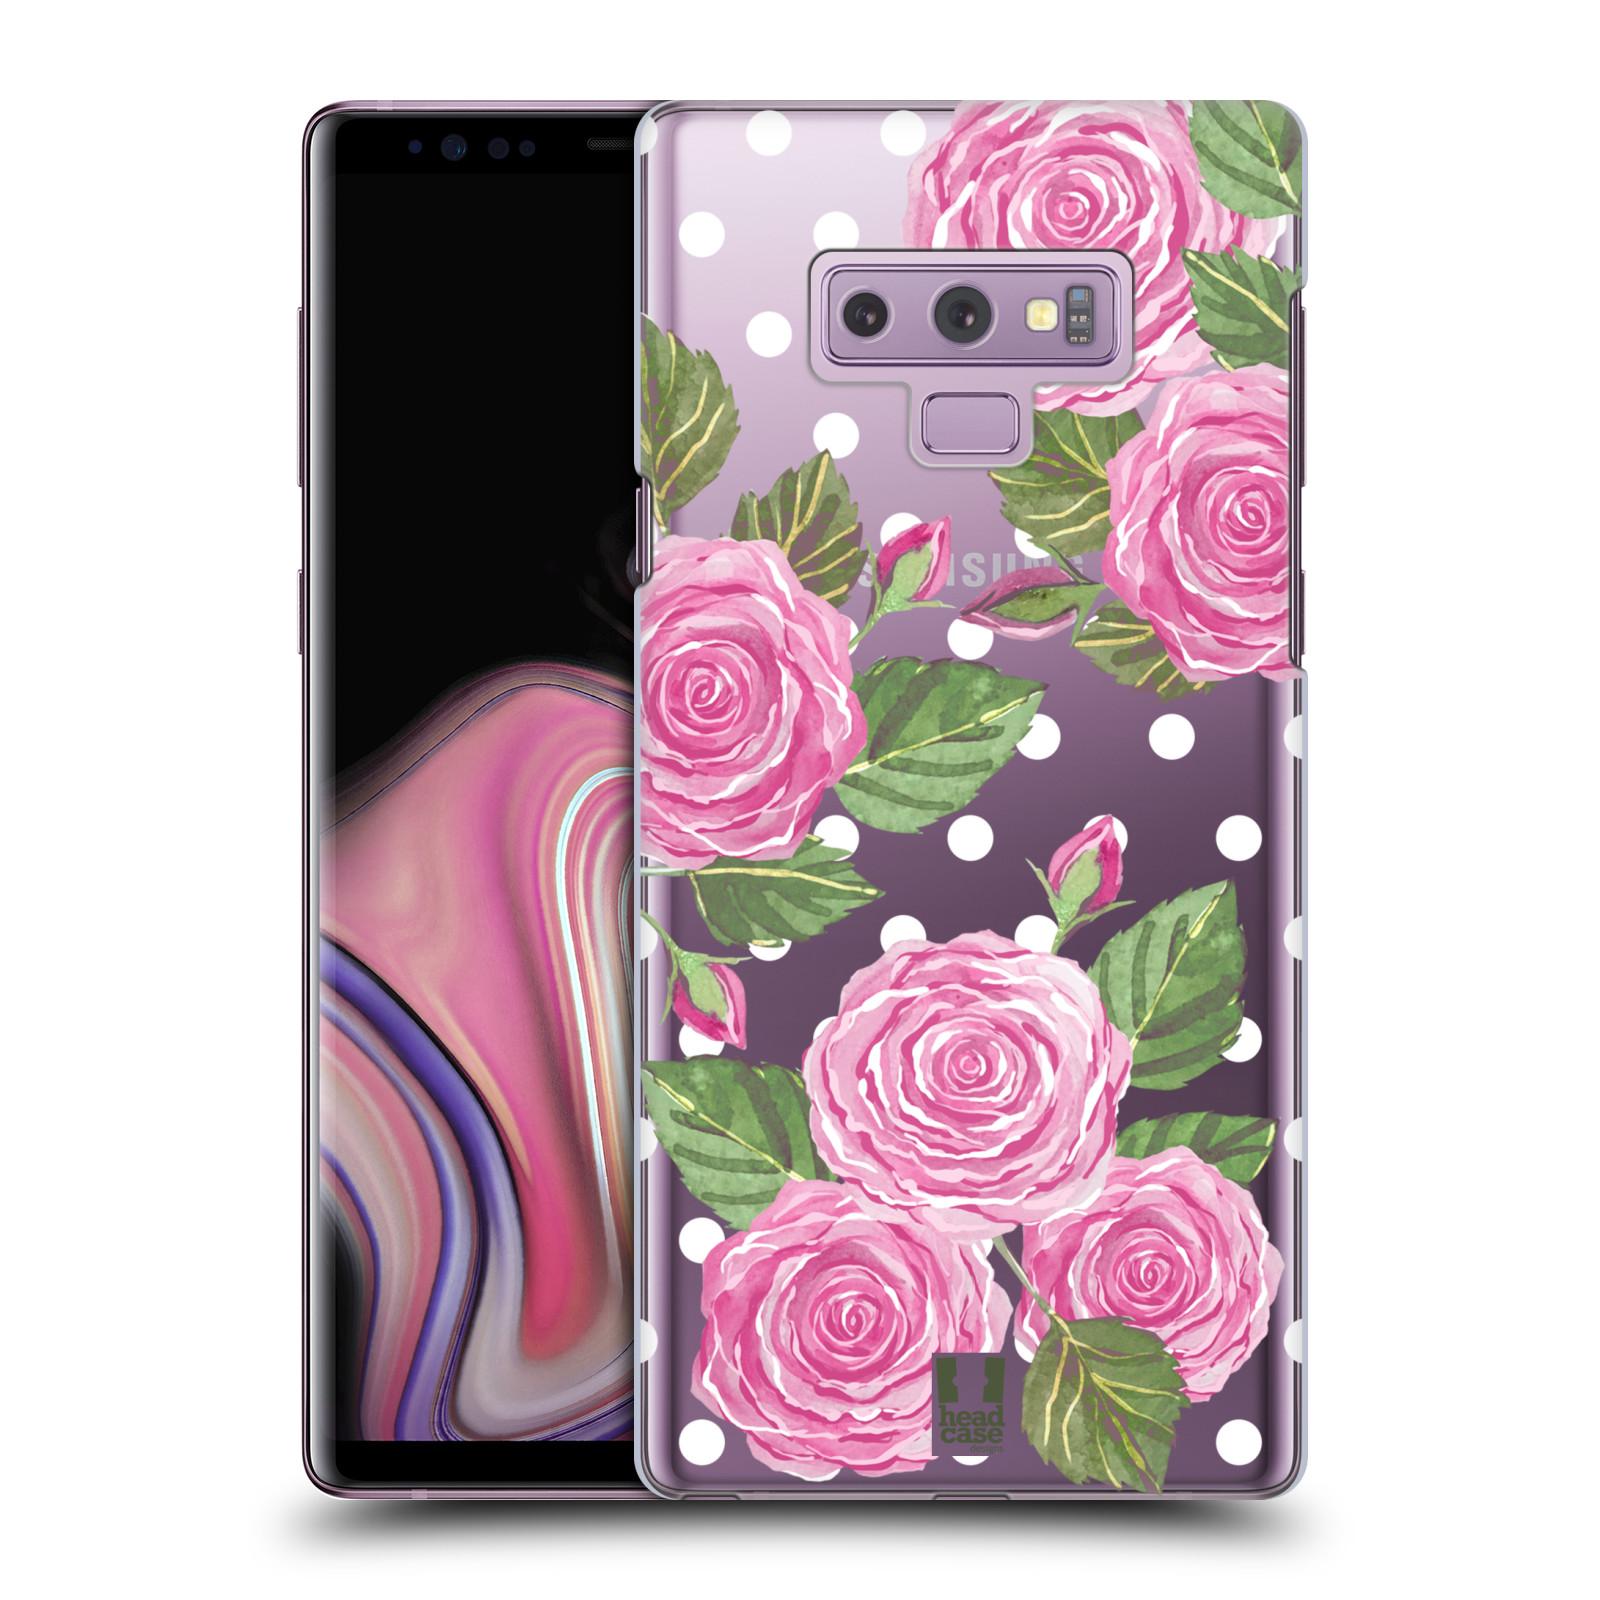 Plastové pouzdro na mobil Samsung Galaxy Note 9 - Head Case - Hezoučké růžičky - průhledné